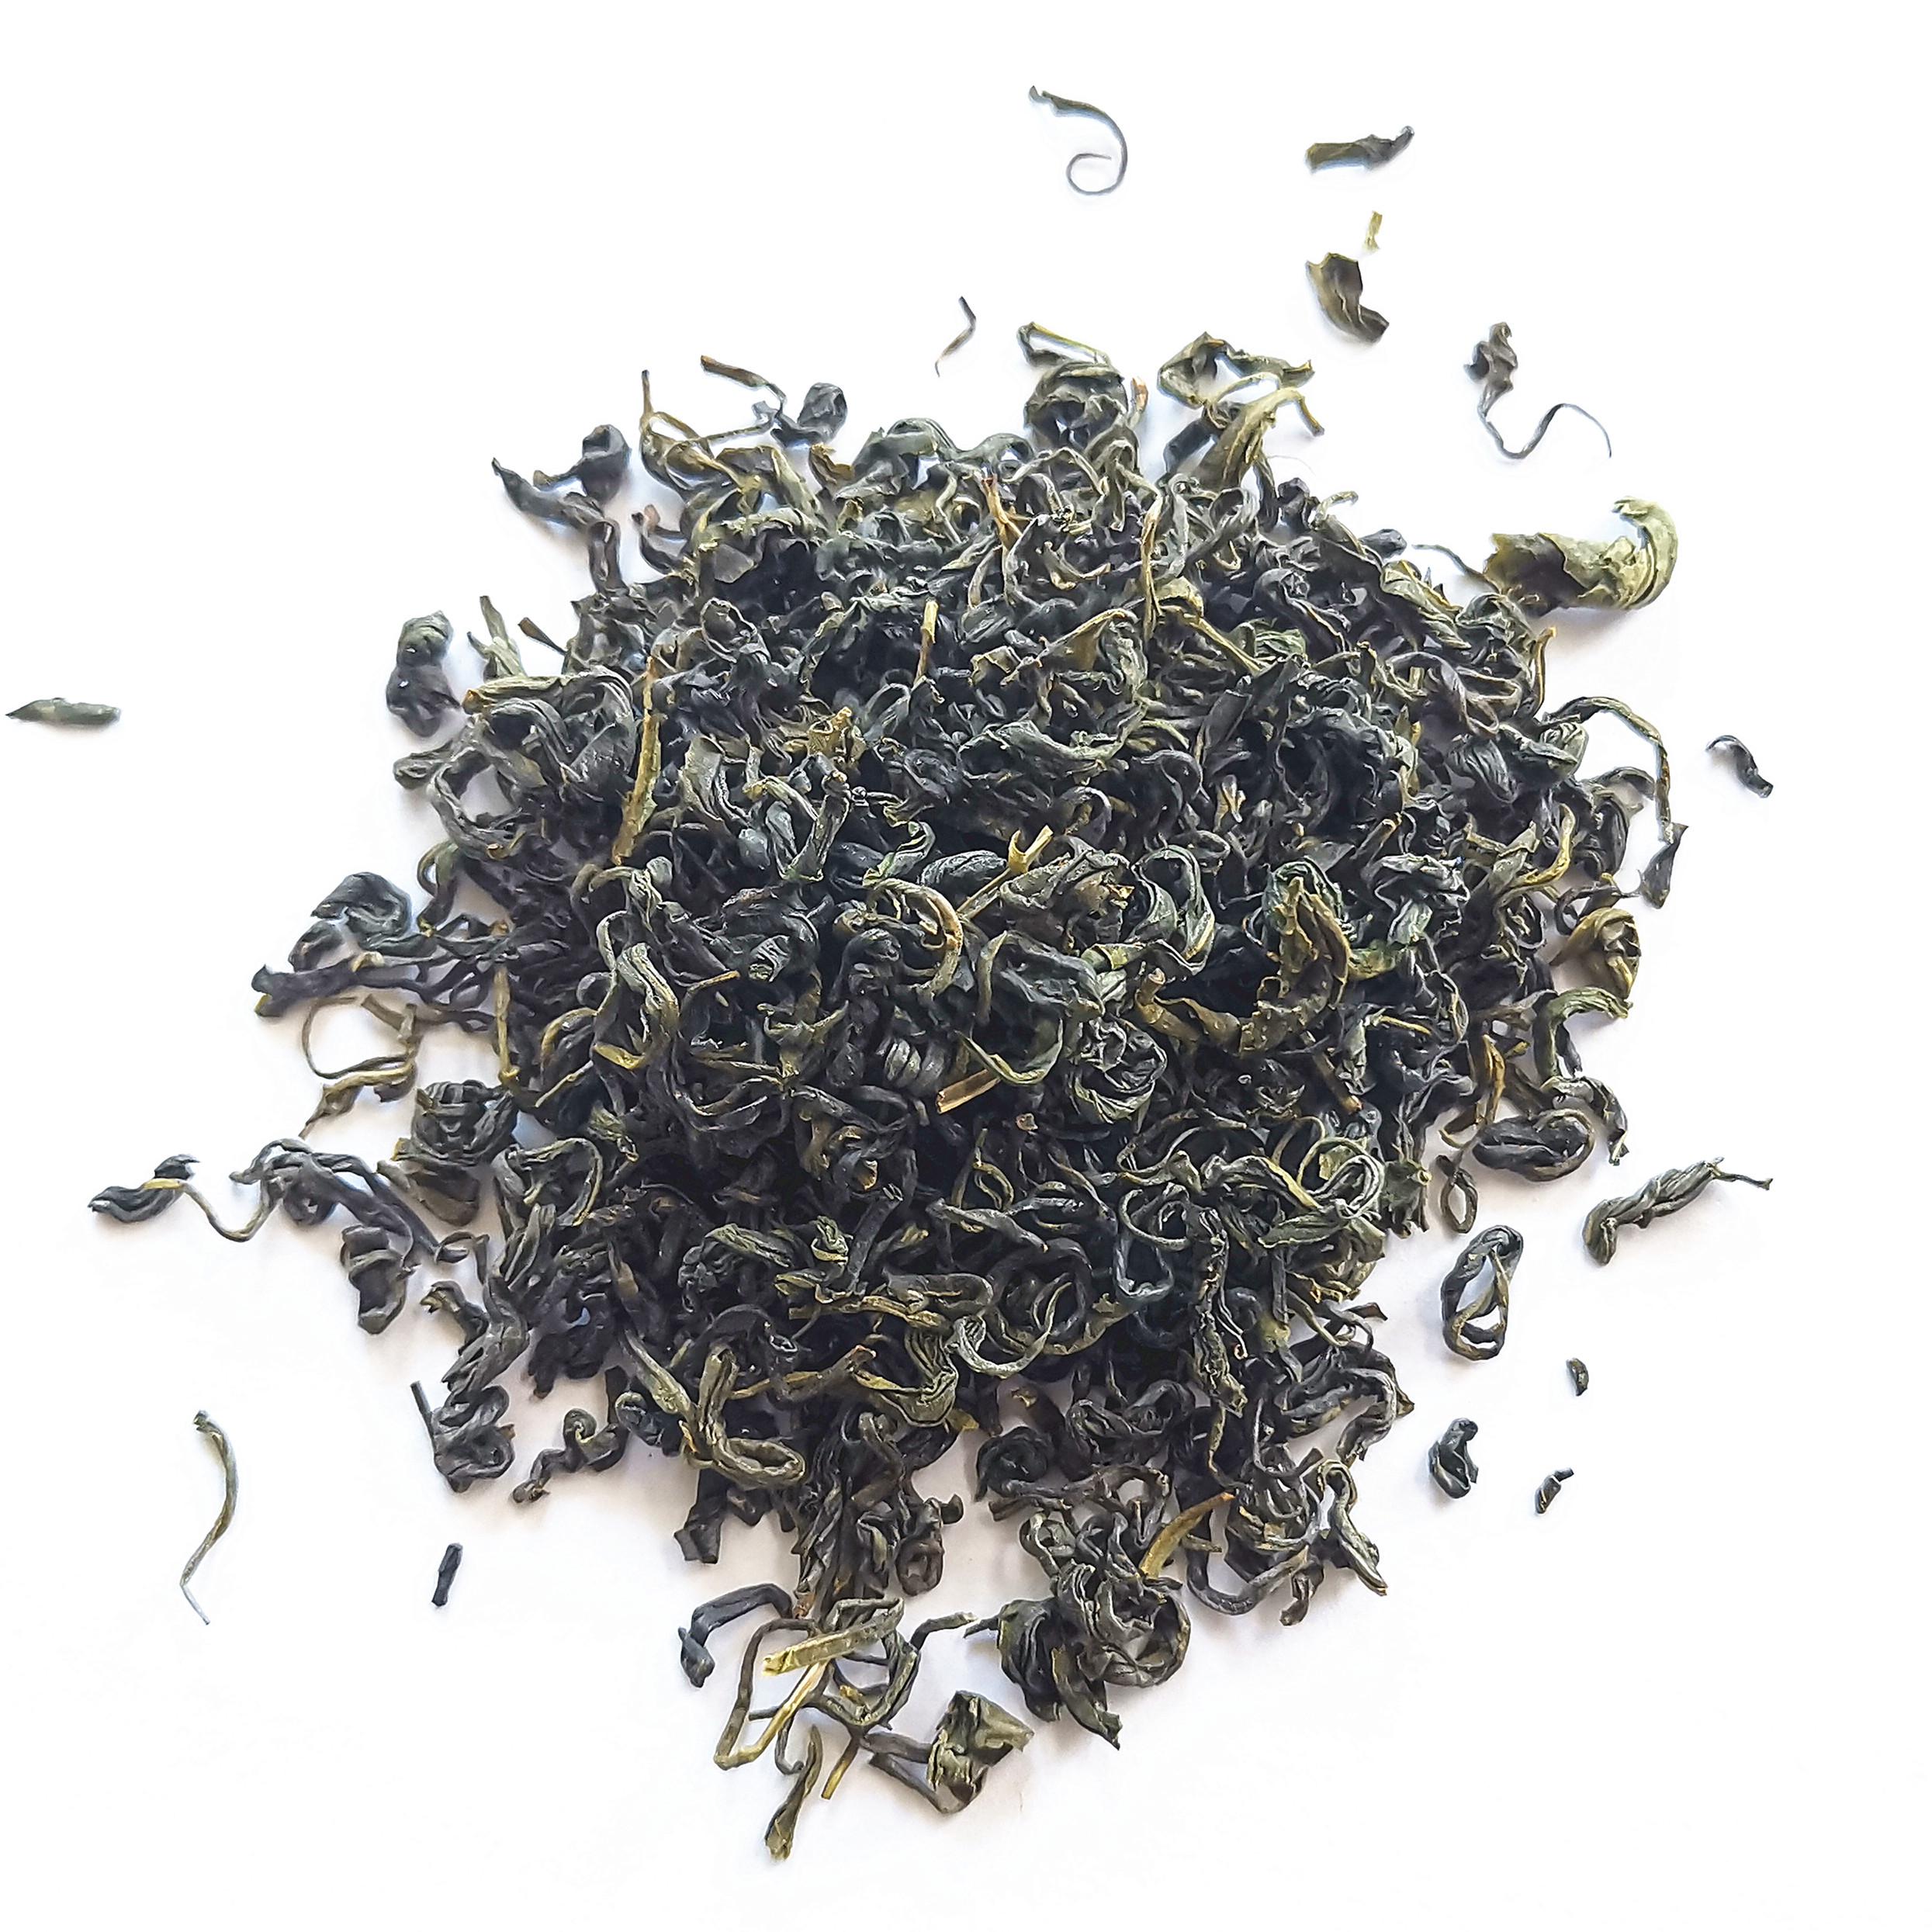 Fine China brands hand made organic tea extract tea green - 4uTea | 4uTea.com